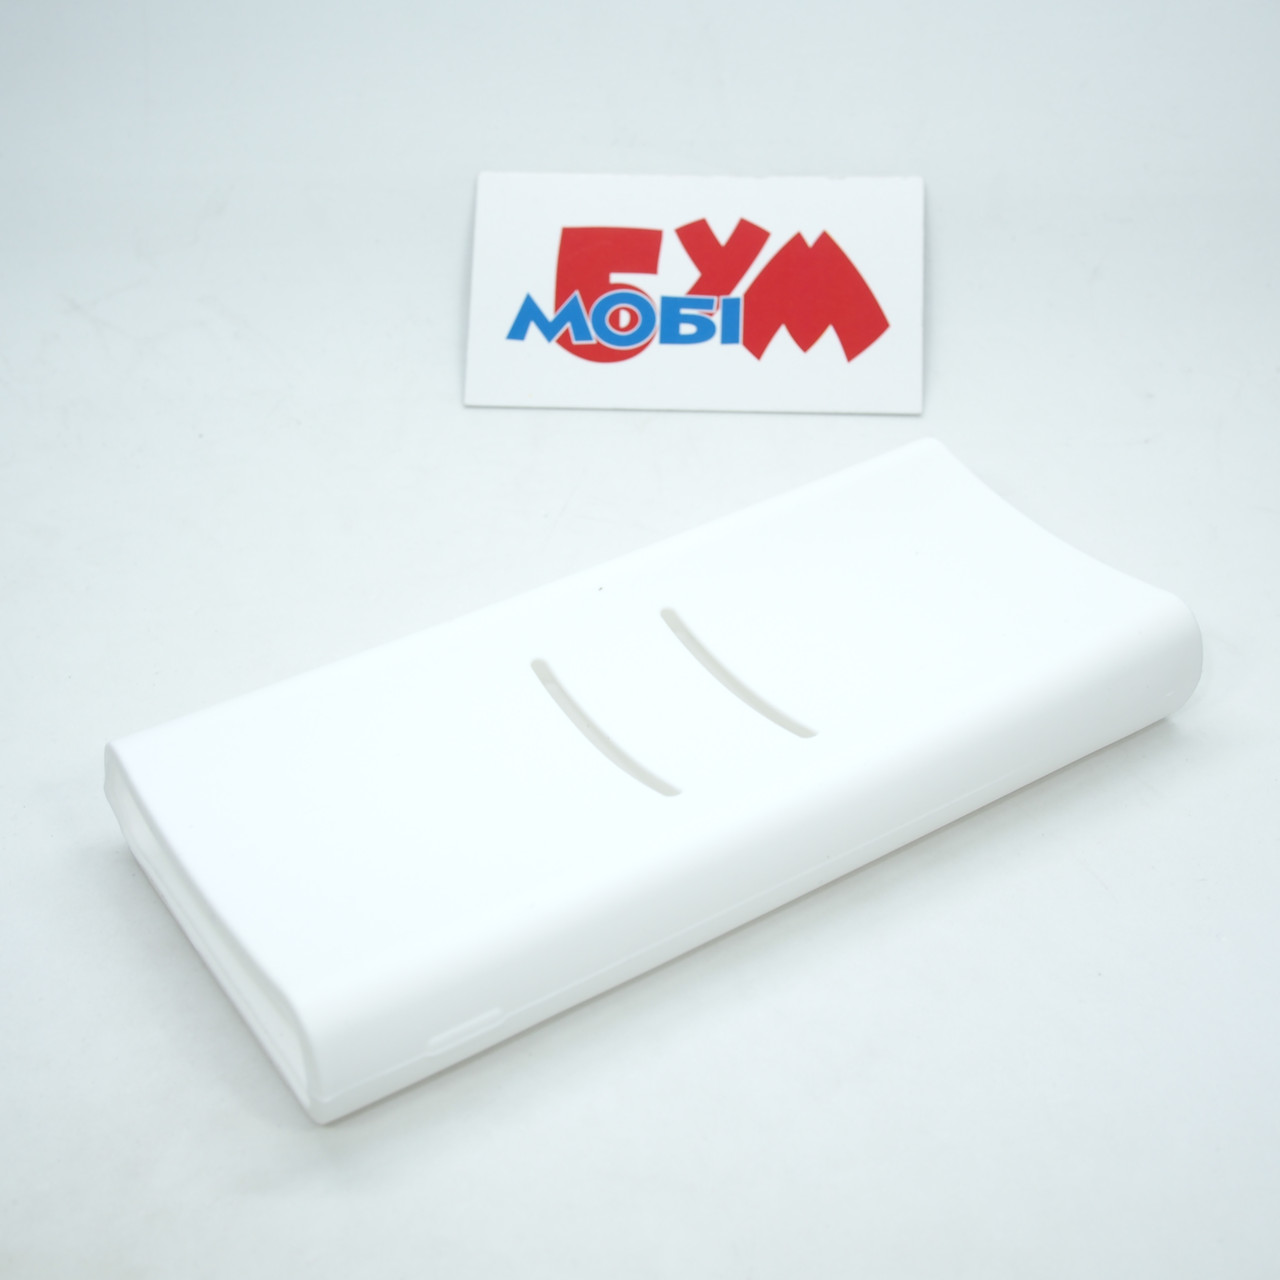 Силиконовый чехол Xiaomi Mi Power Bank 2C 20000mAh white (SPCCXM20W)